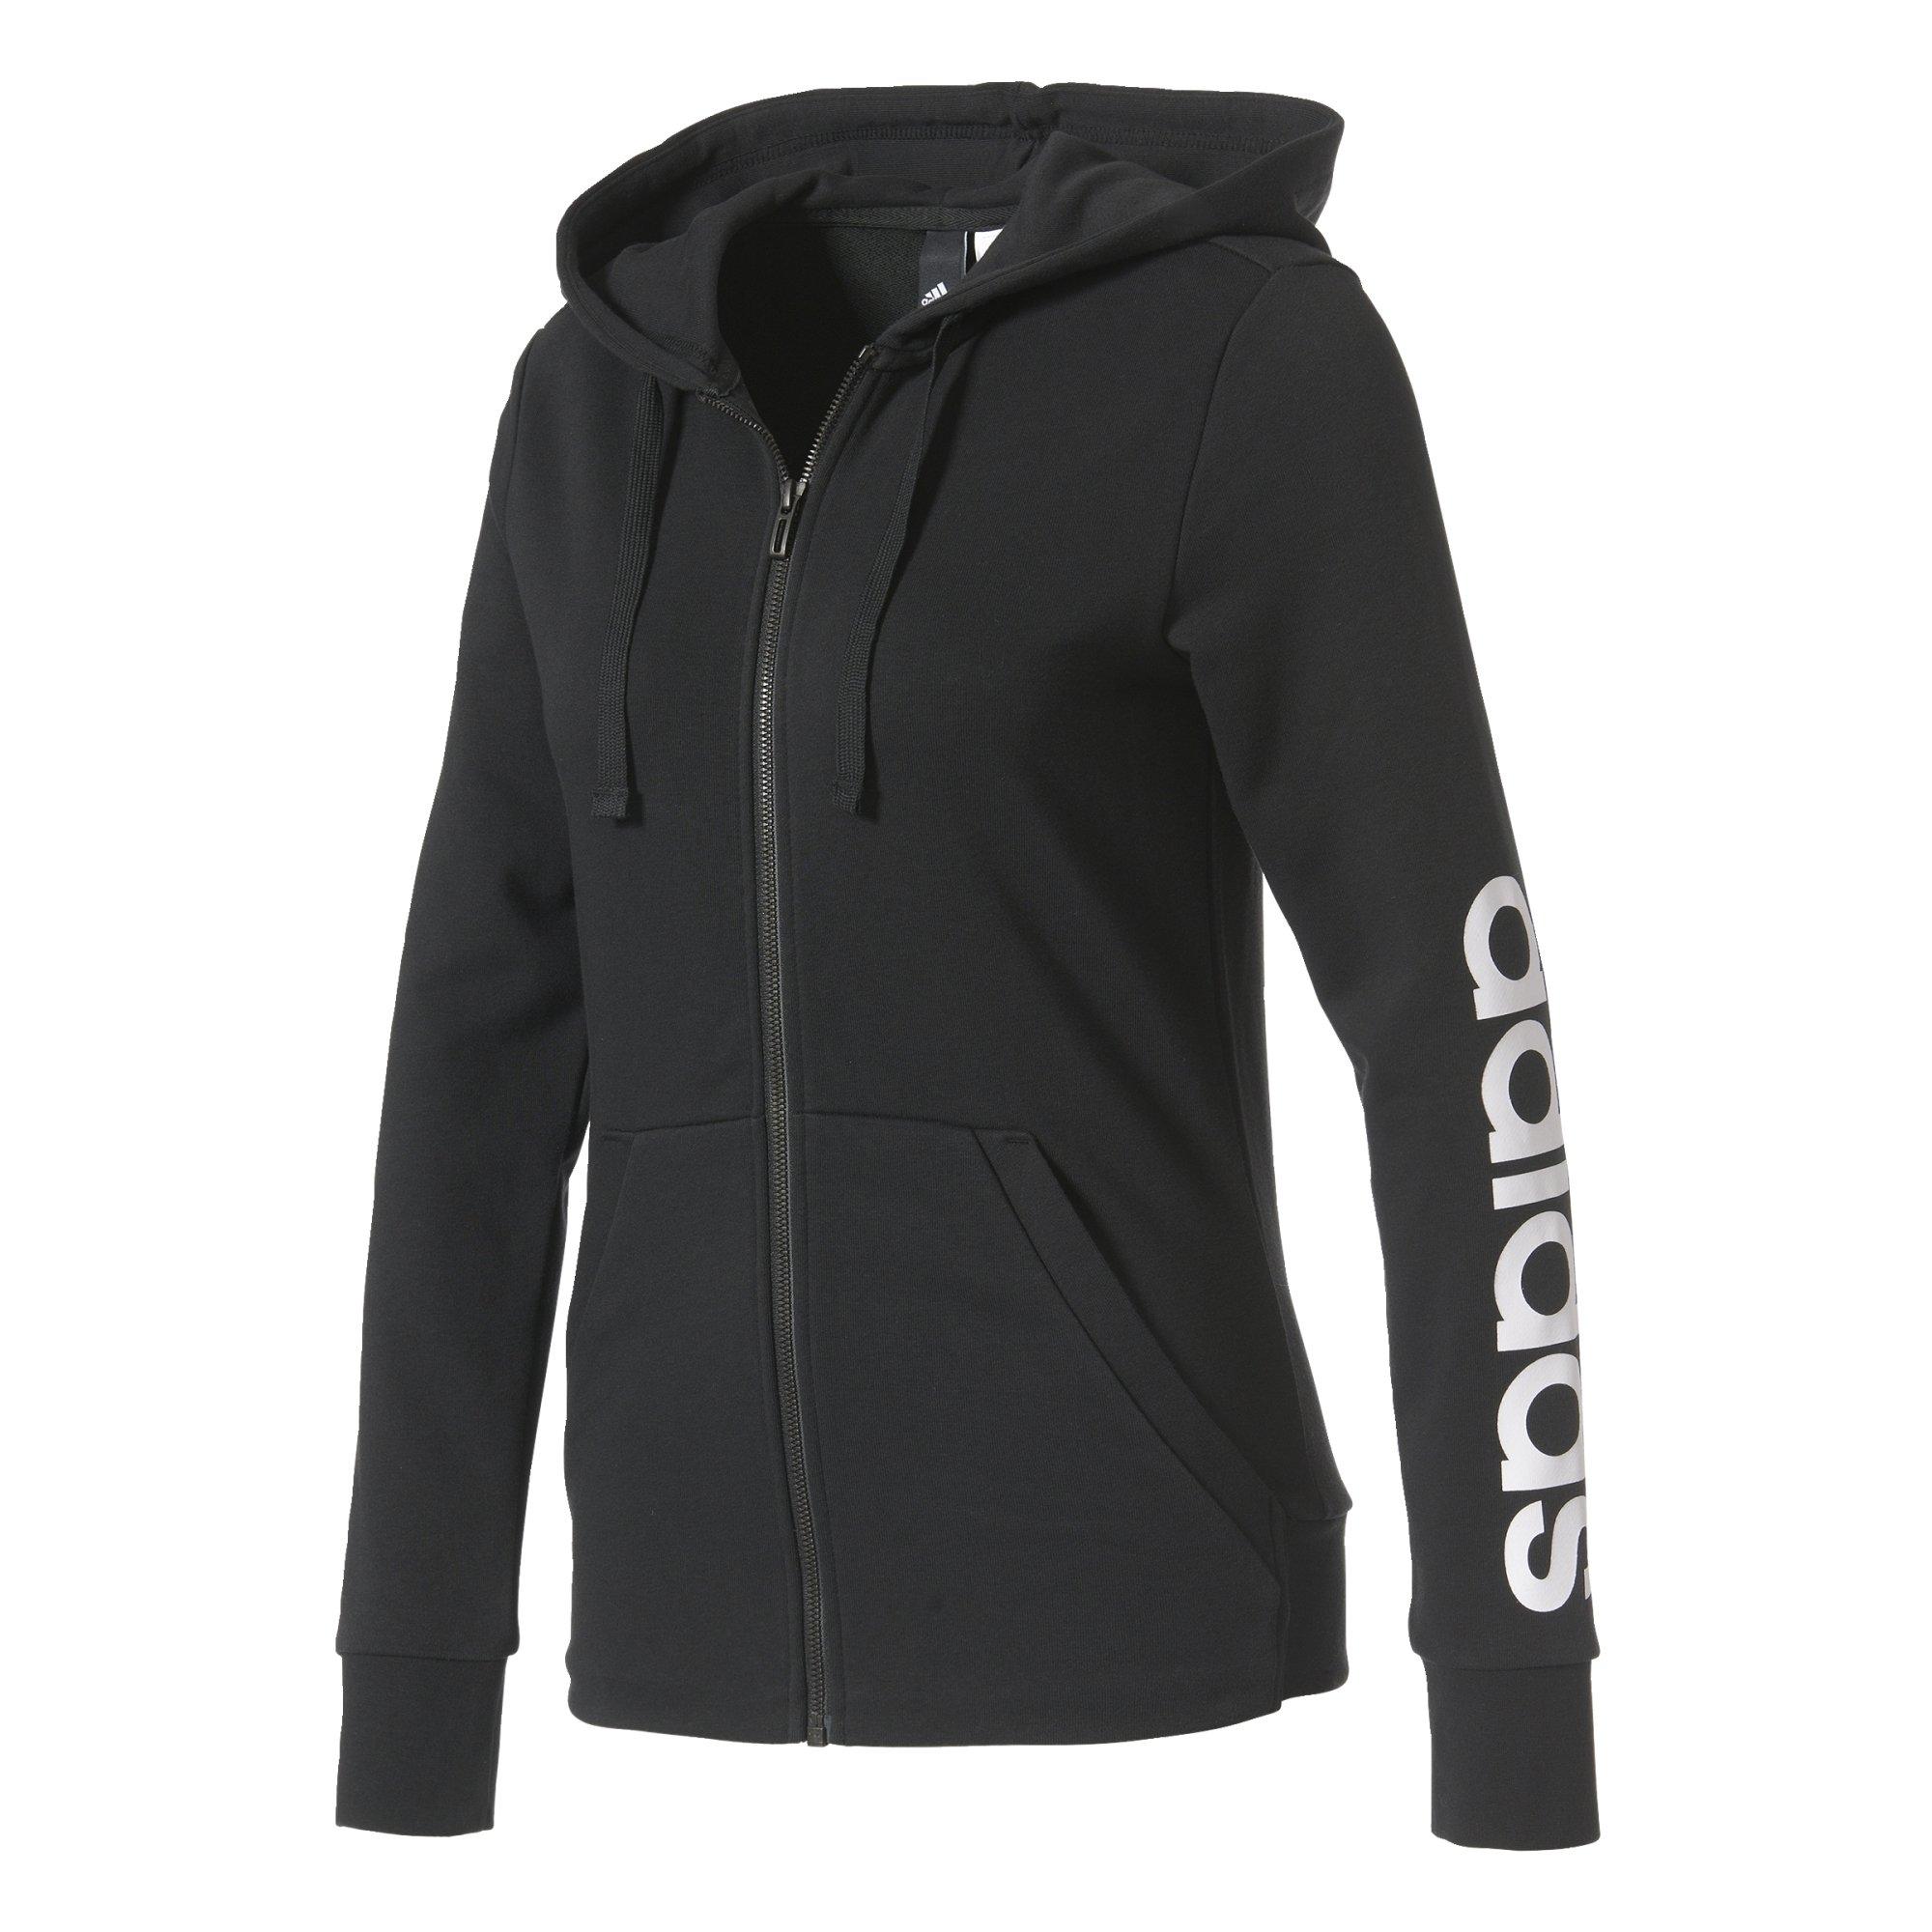 adidas Essentials Linear Full Zip Hoodie (Black, XS) by adidas (Image #1)